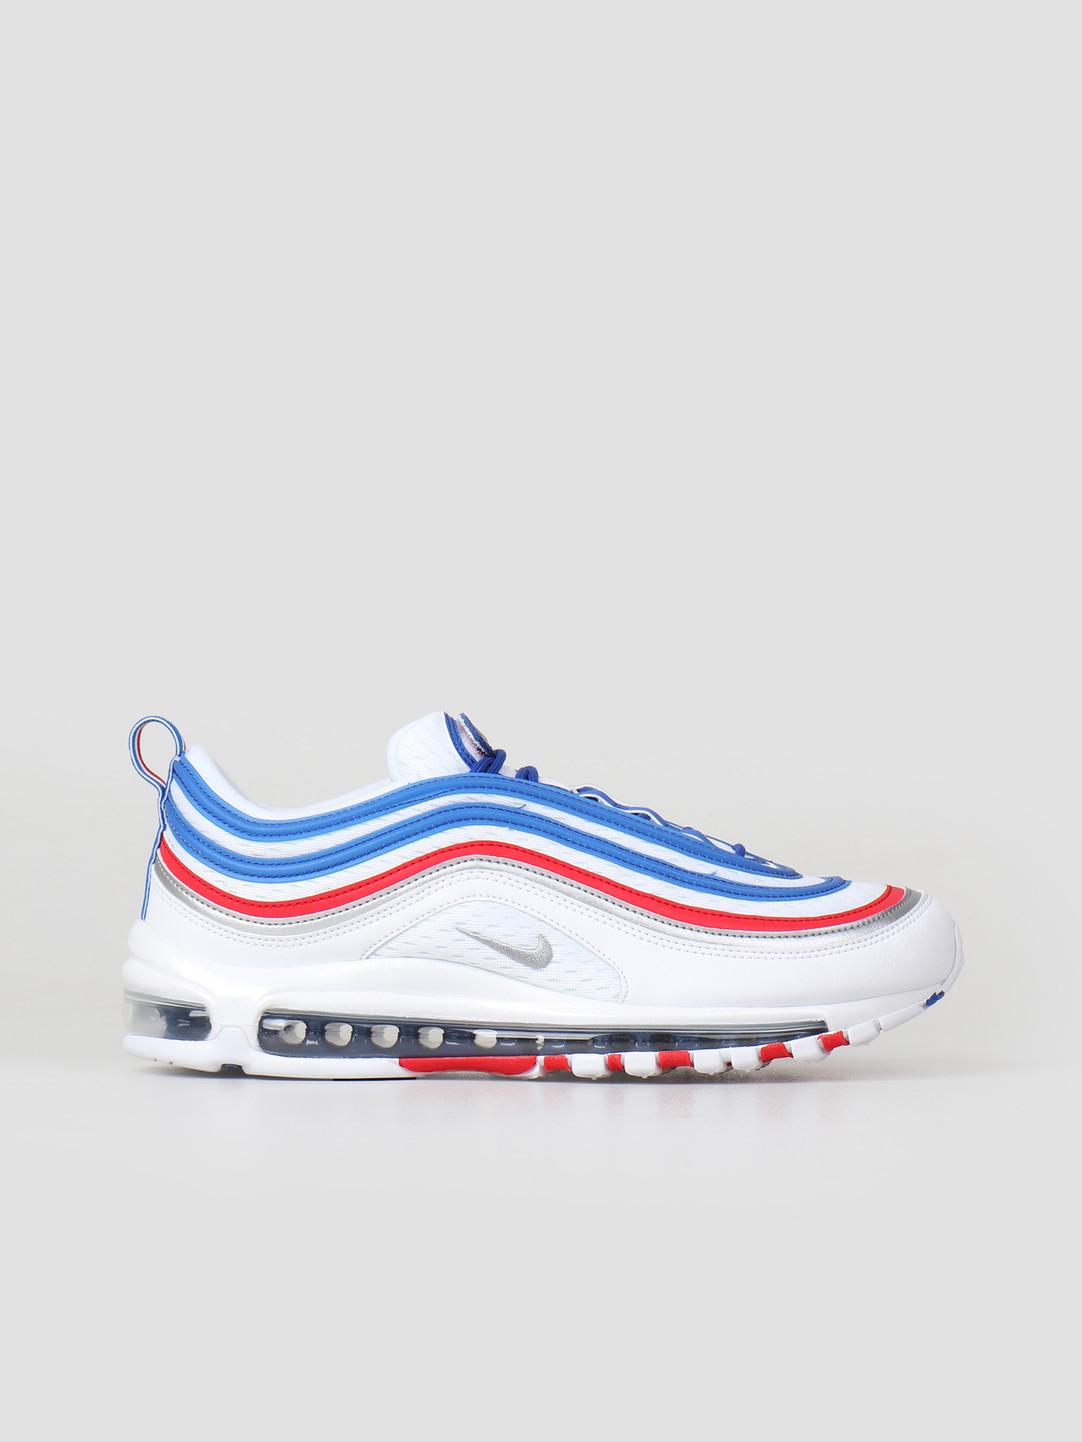 7308726245 Nike Air Max 97 Shoe Game Royal Metallic Silver 921826-404 | FRESHCOTTON